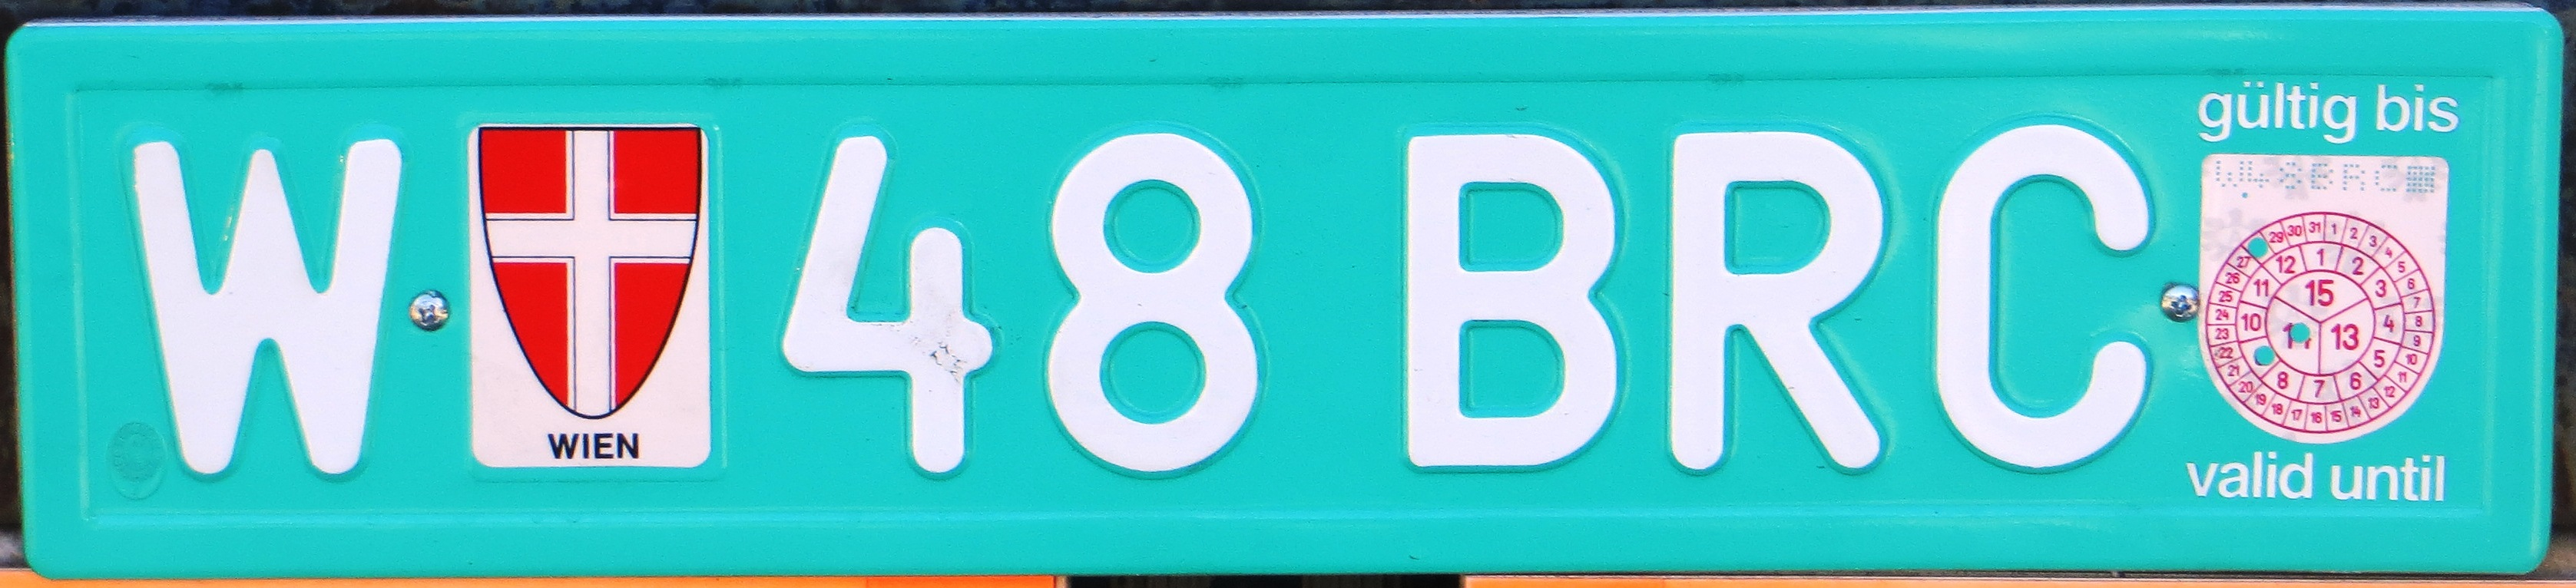 License Plate Camera >> File:Austria export license plate.JPG - Wikimedia Commons